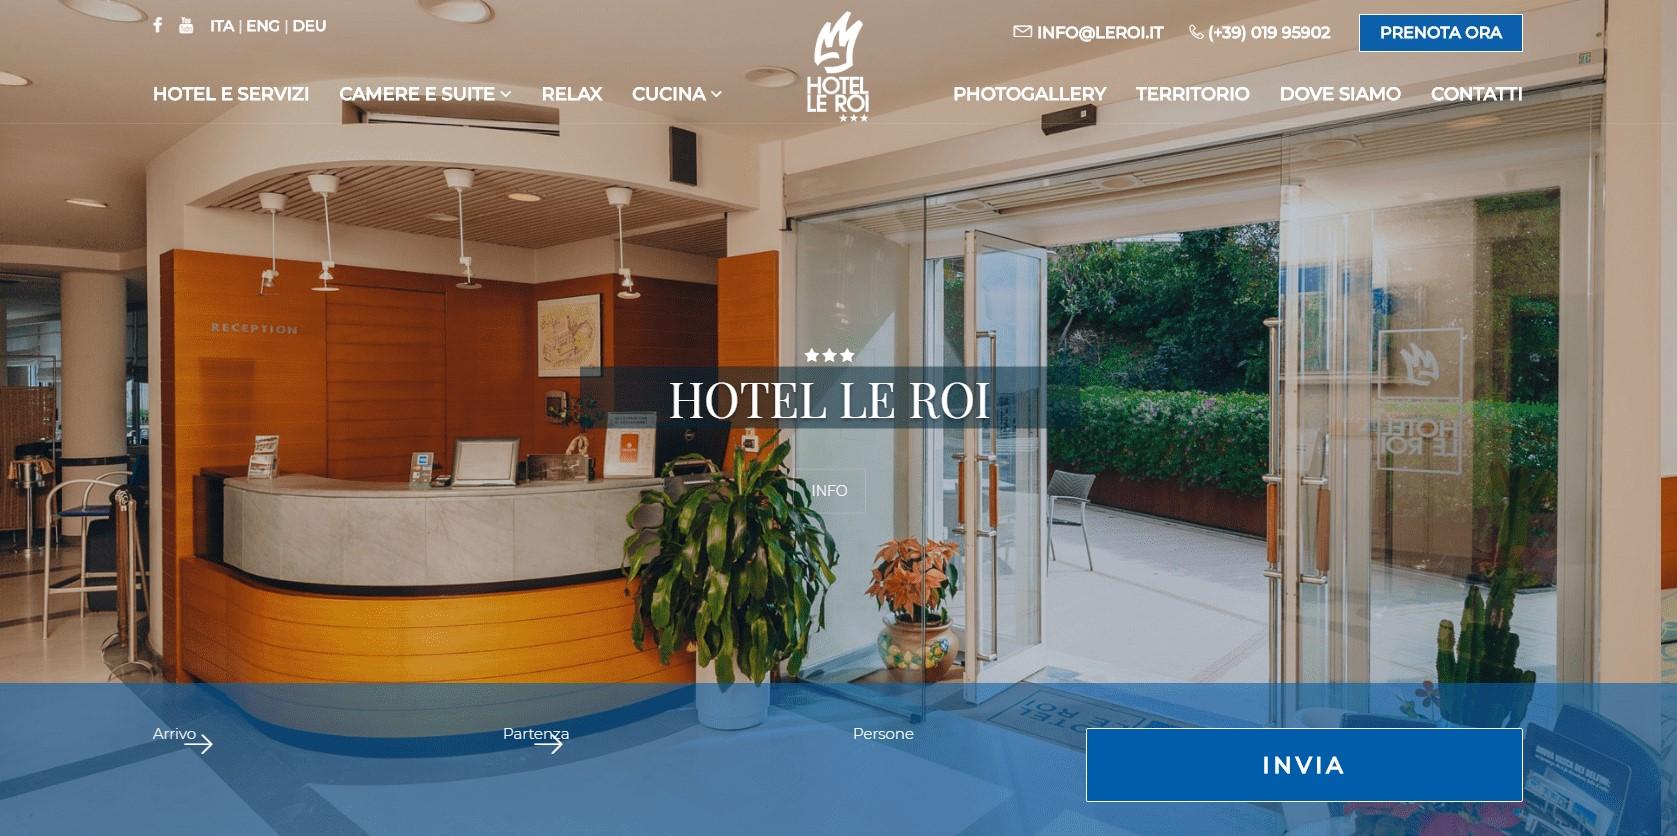 Hotel Le Roi Varazze 1 - Savona